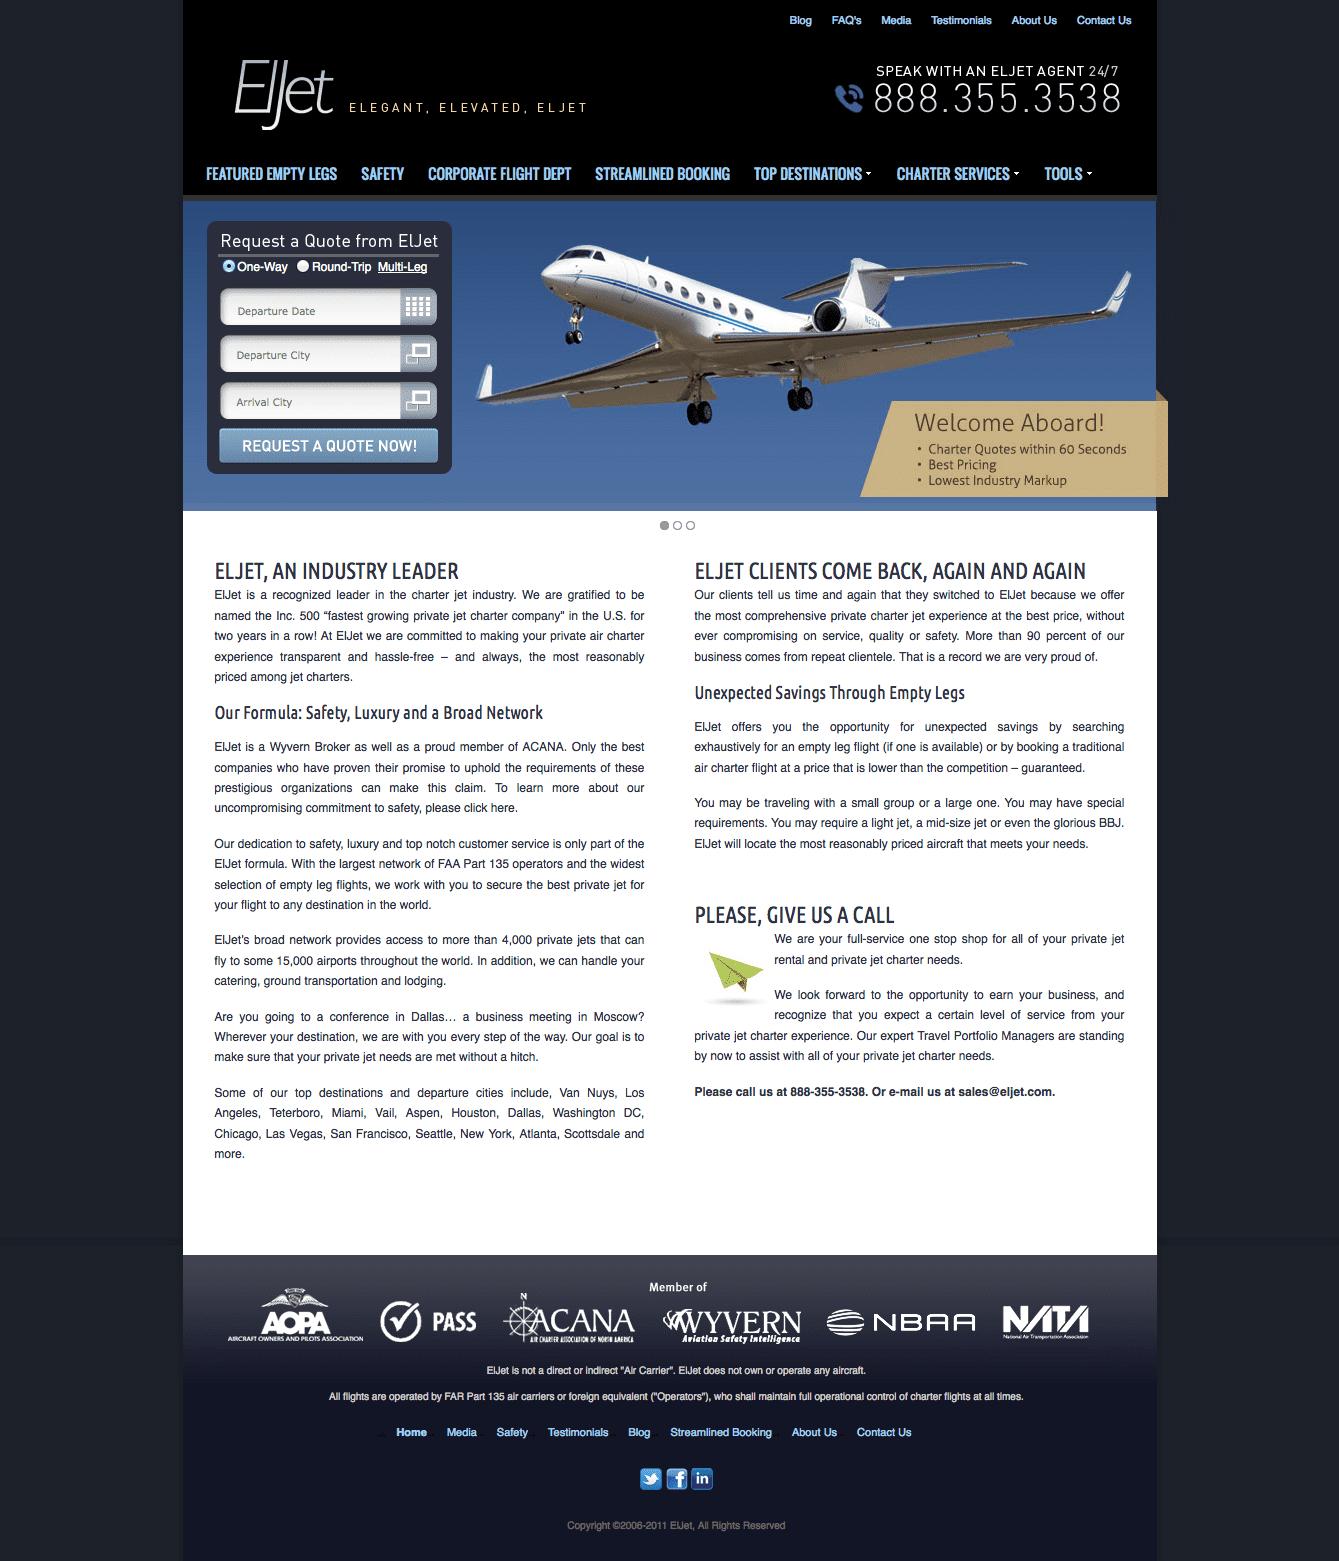 ElJet___Private_Jet_Charter_Flights___Empty_Leg_Jet_Charters_2011-11-19_09-33-00